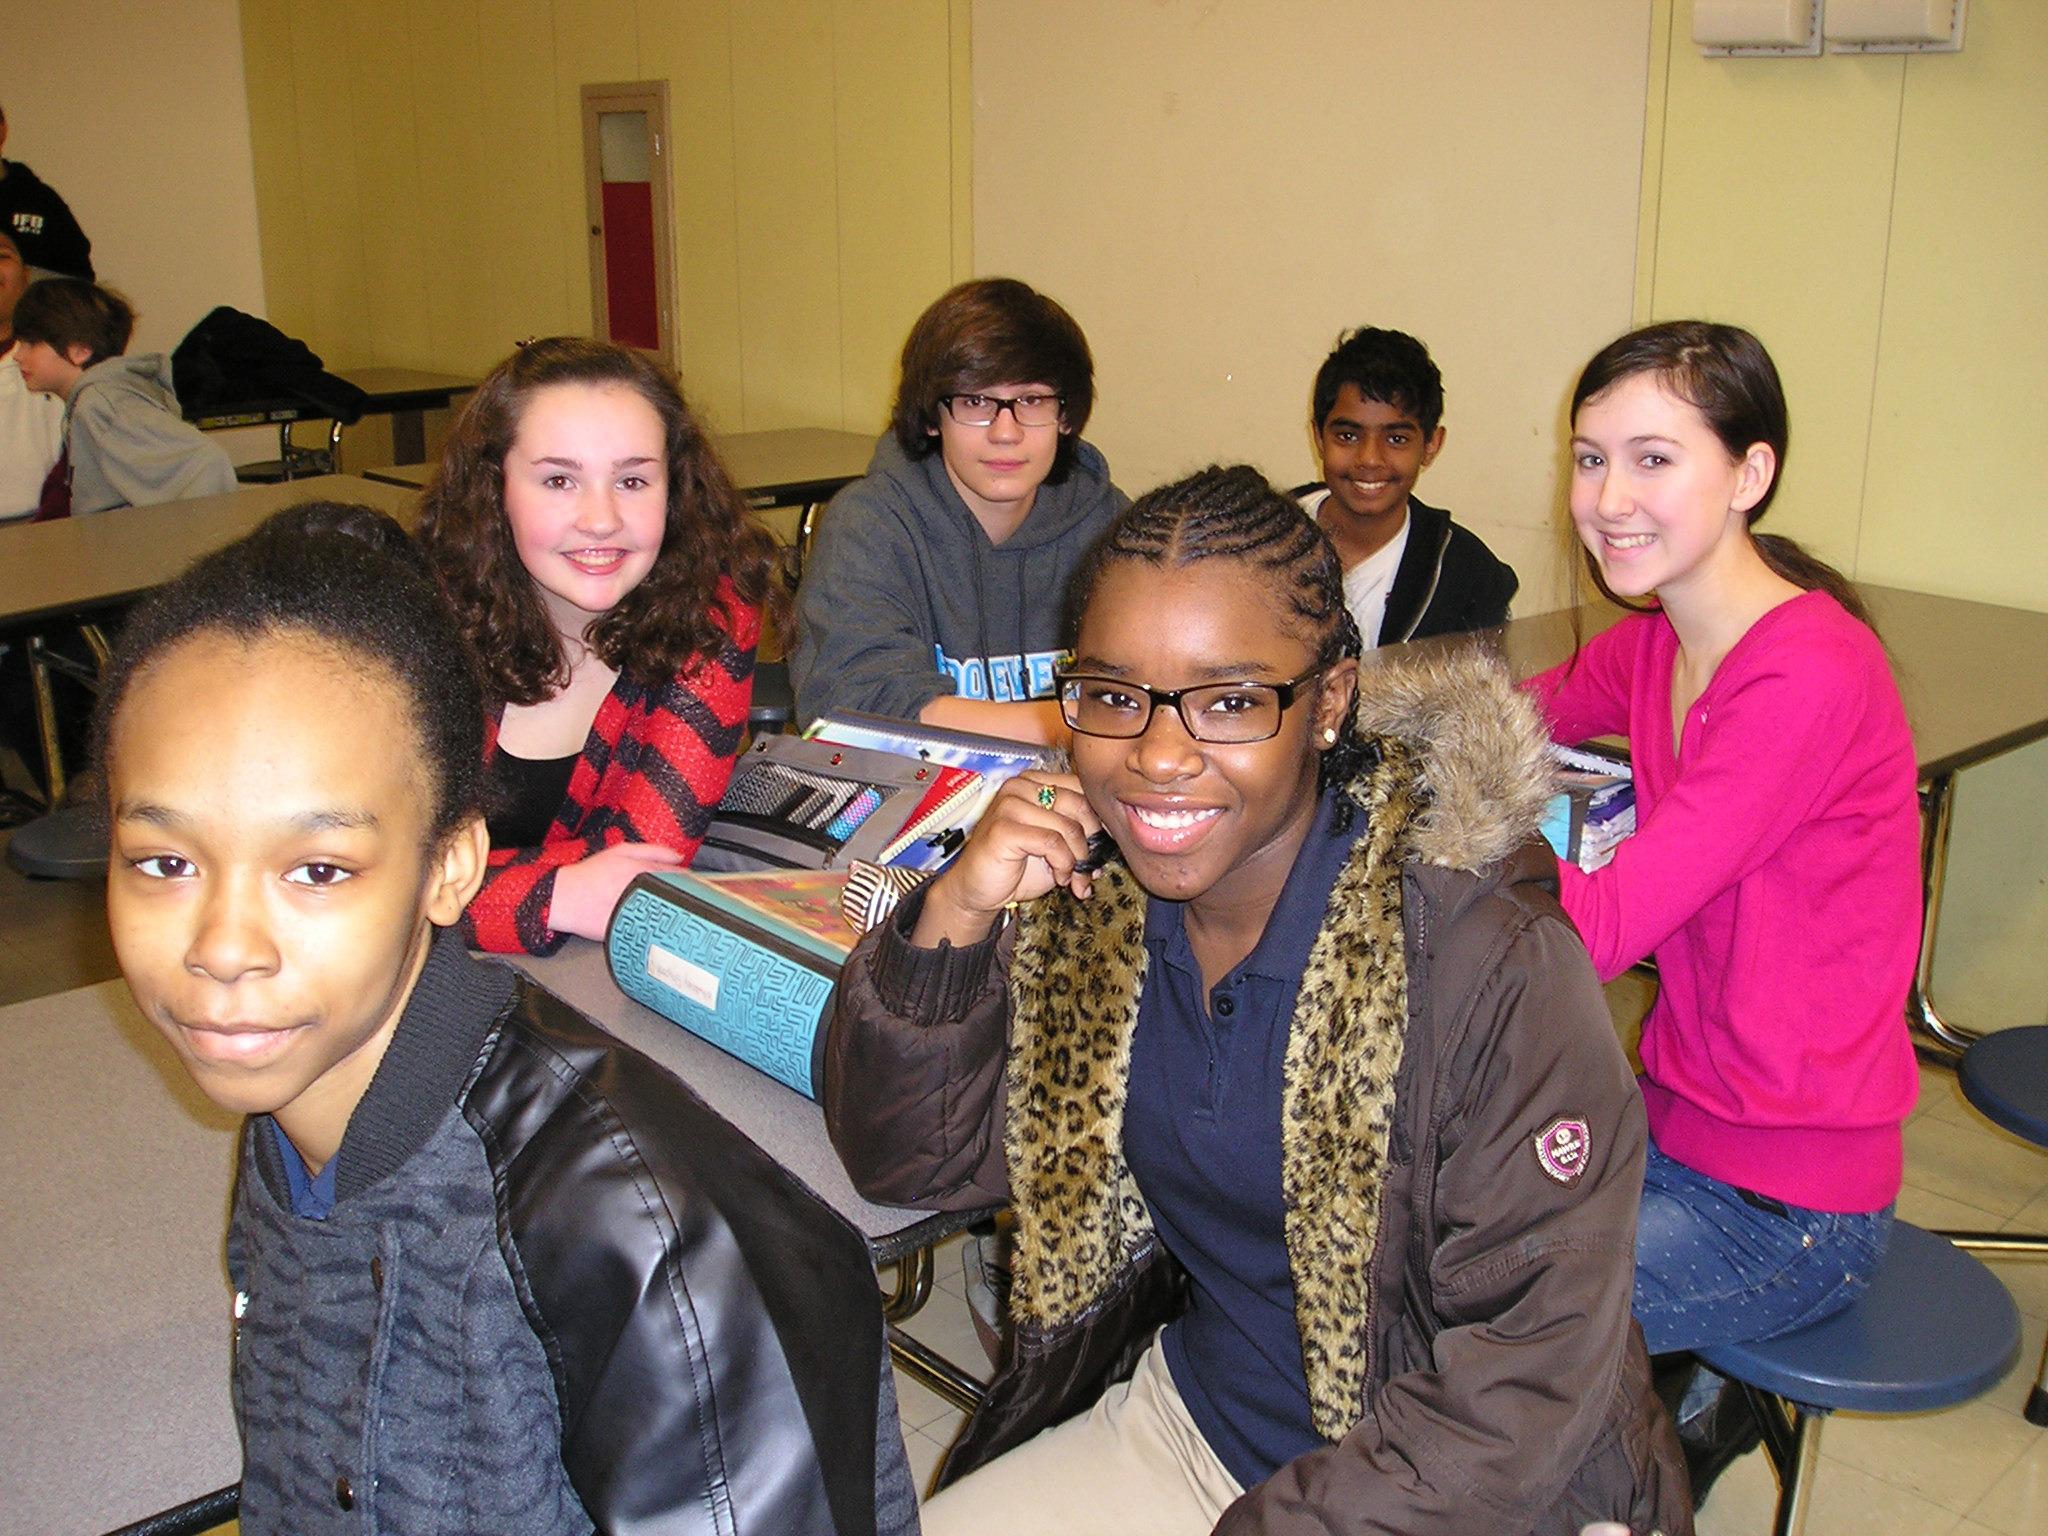 c64b983c3cc5d4d30975_Plainfield___Roosevelt_students_in_cafeteria_discussion.JPG